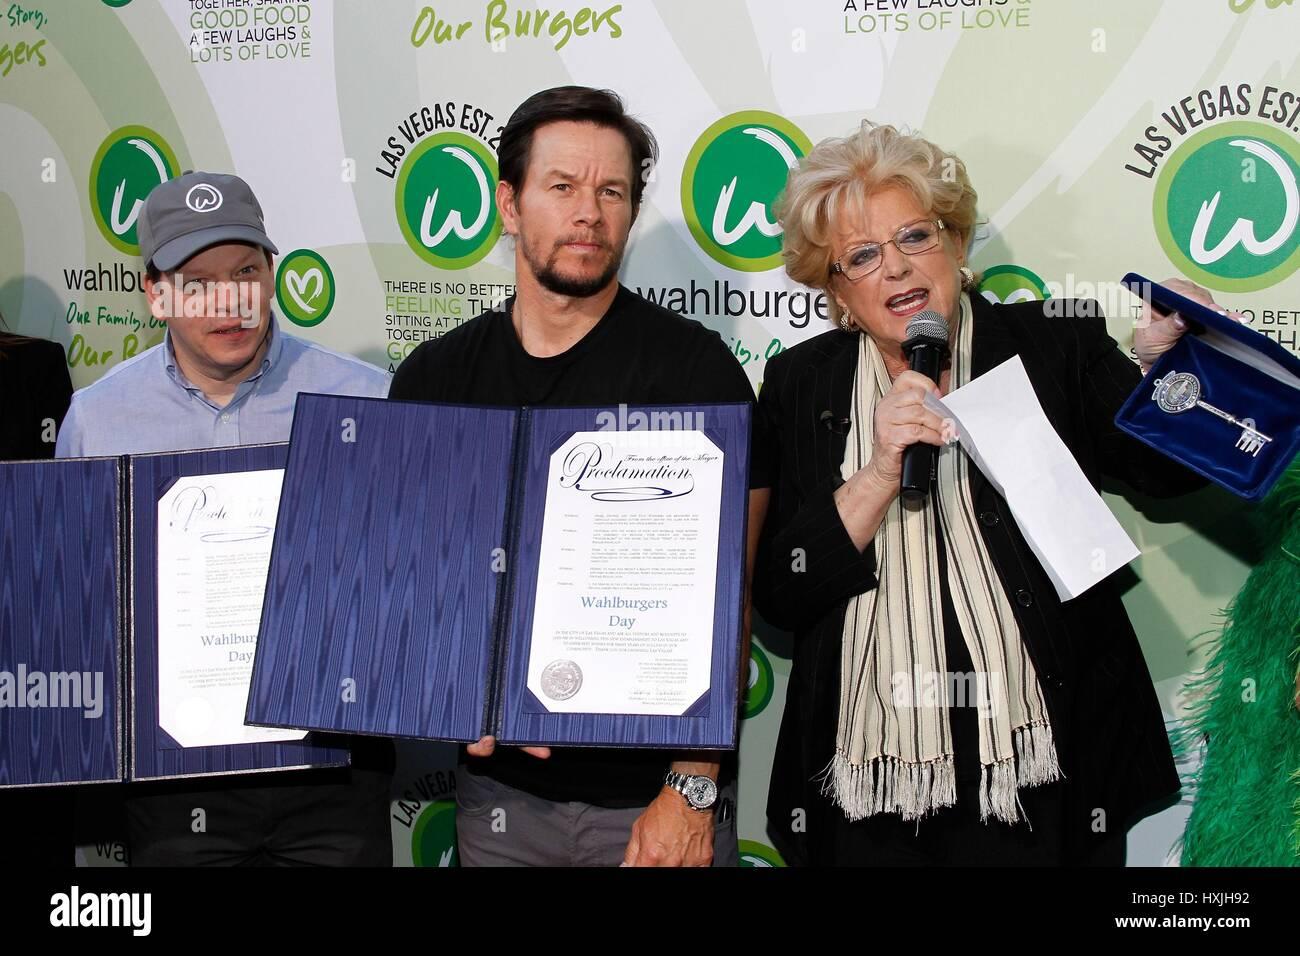 Las Vegas, NV, USA. 28. März 2017. Paul Wahlberg, Mark Wahlberg, Caroline Goodman (Bürgermeister von Las Stockbild